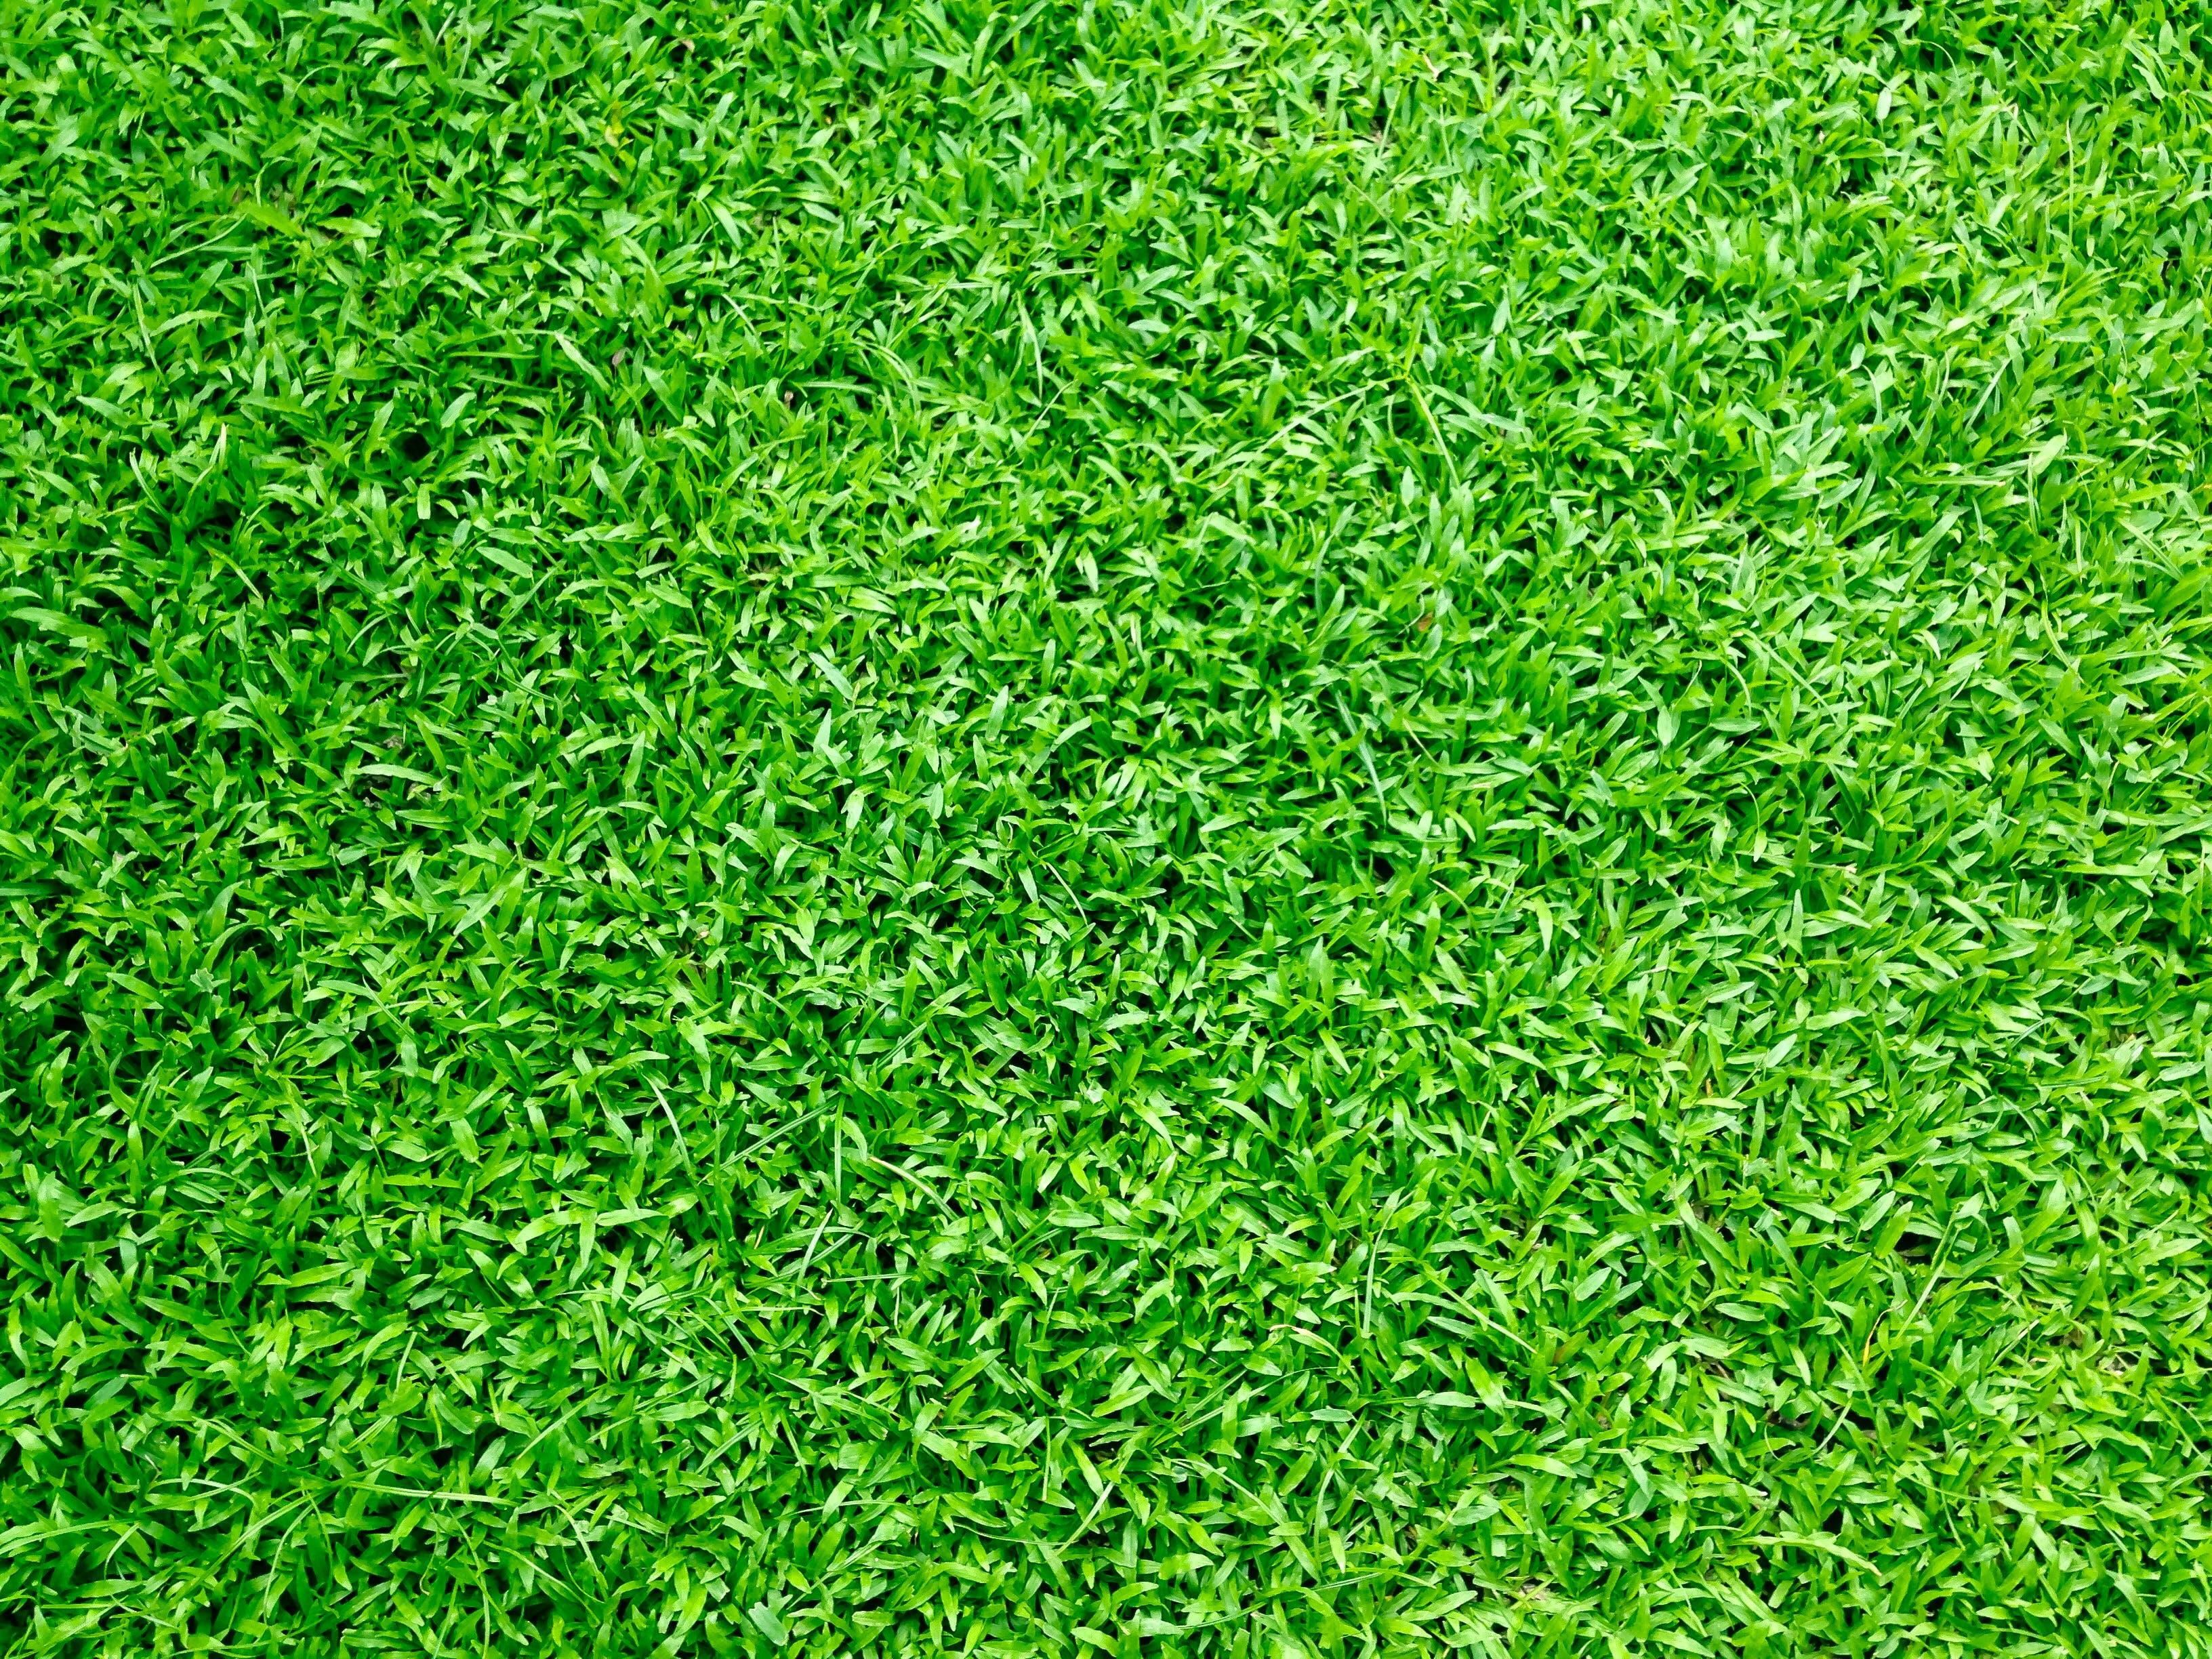 Kostenloses Stock Foto zu natur, feld, sommer, garten